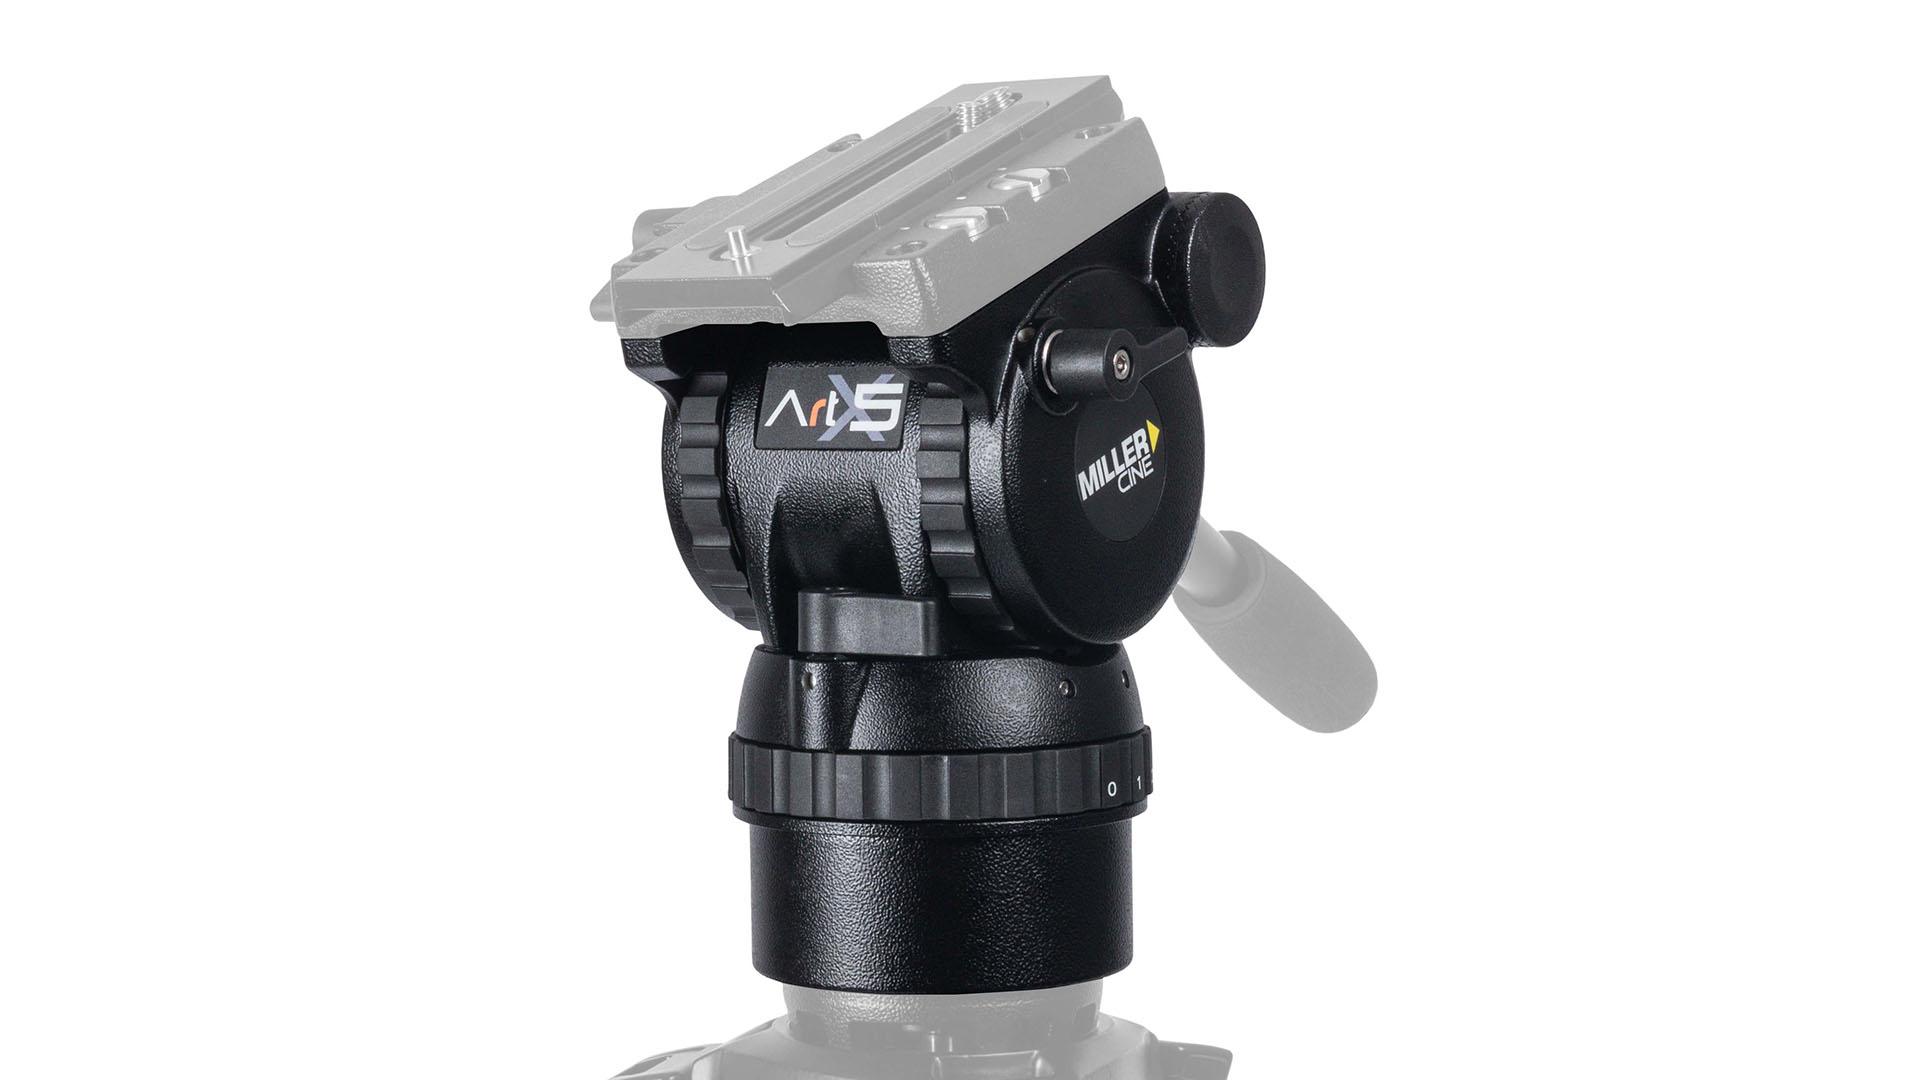 The new Miller ArtX fluid head. Image: Miller.